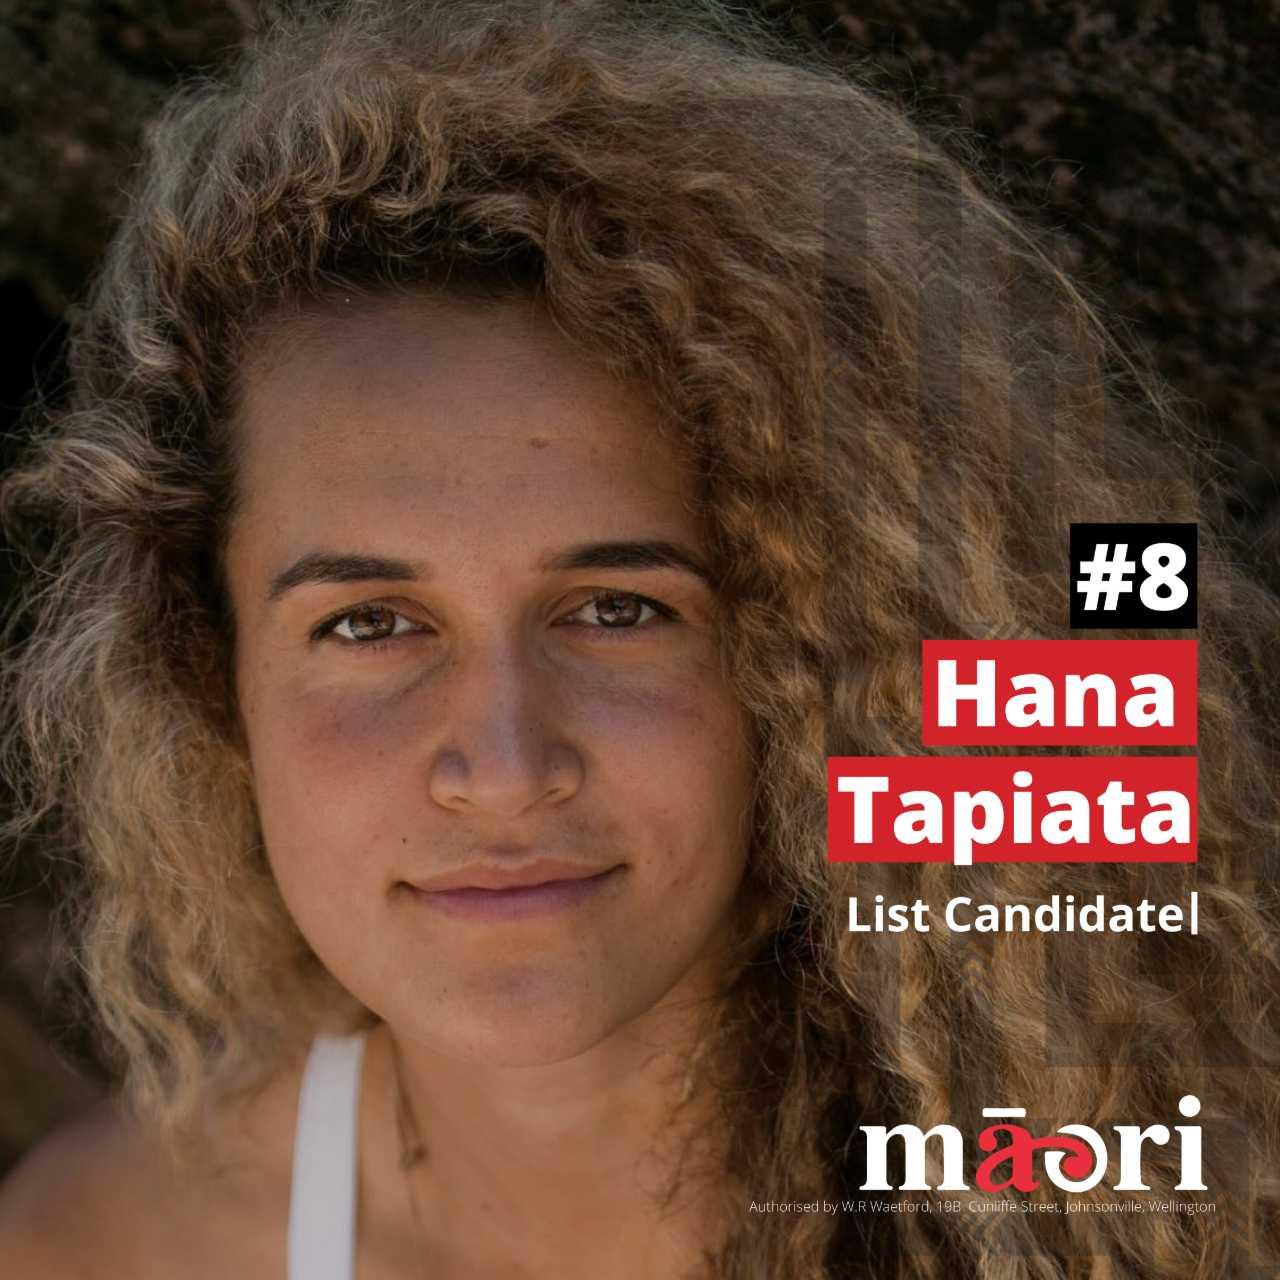 Hana Tapiata, List Candidate